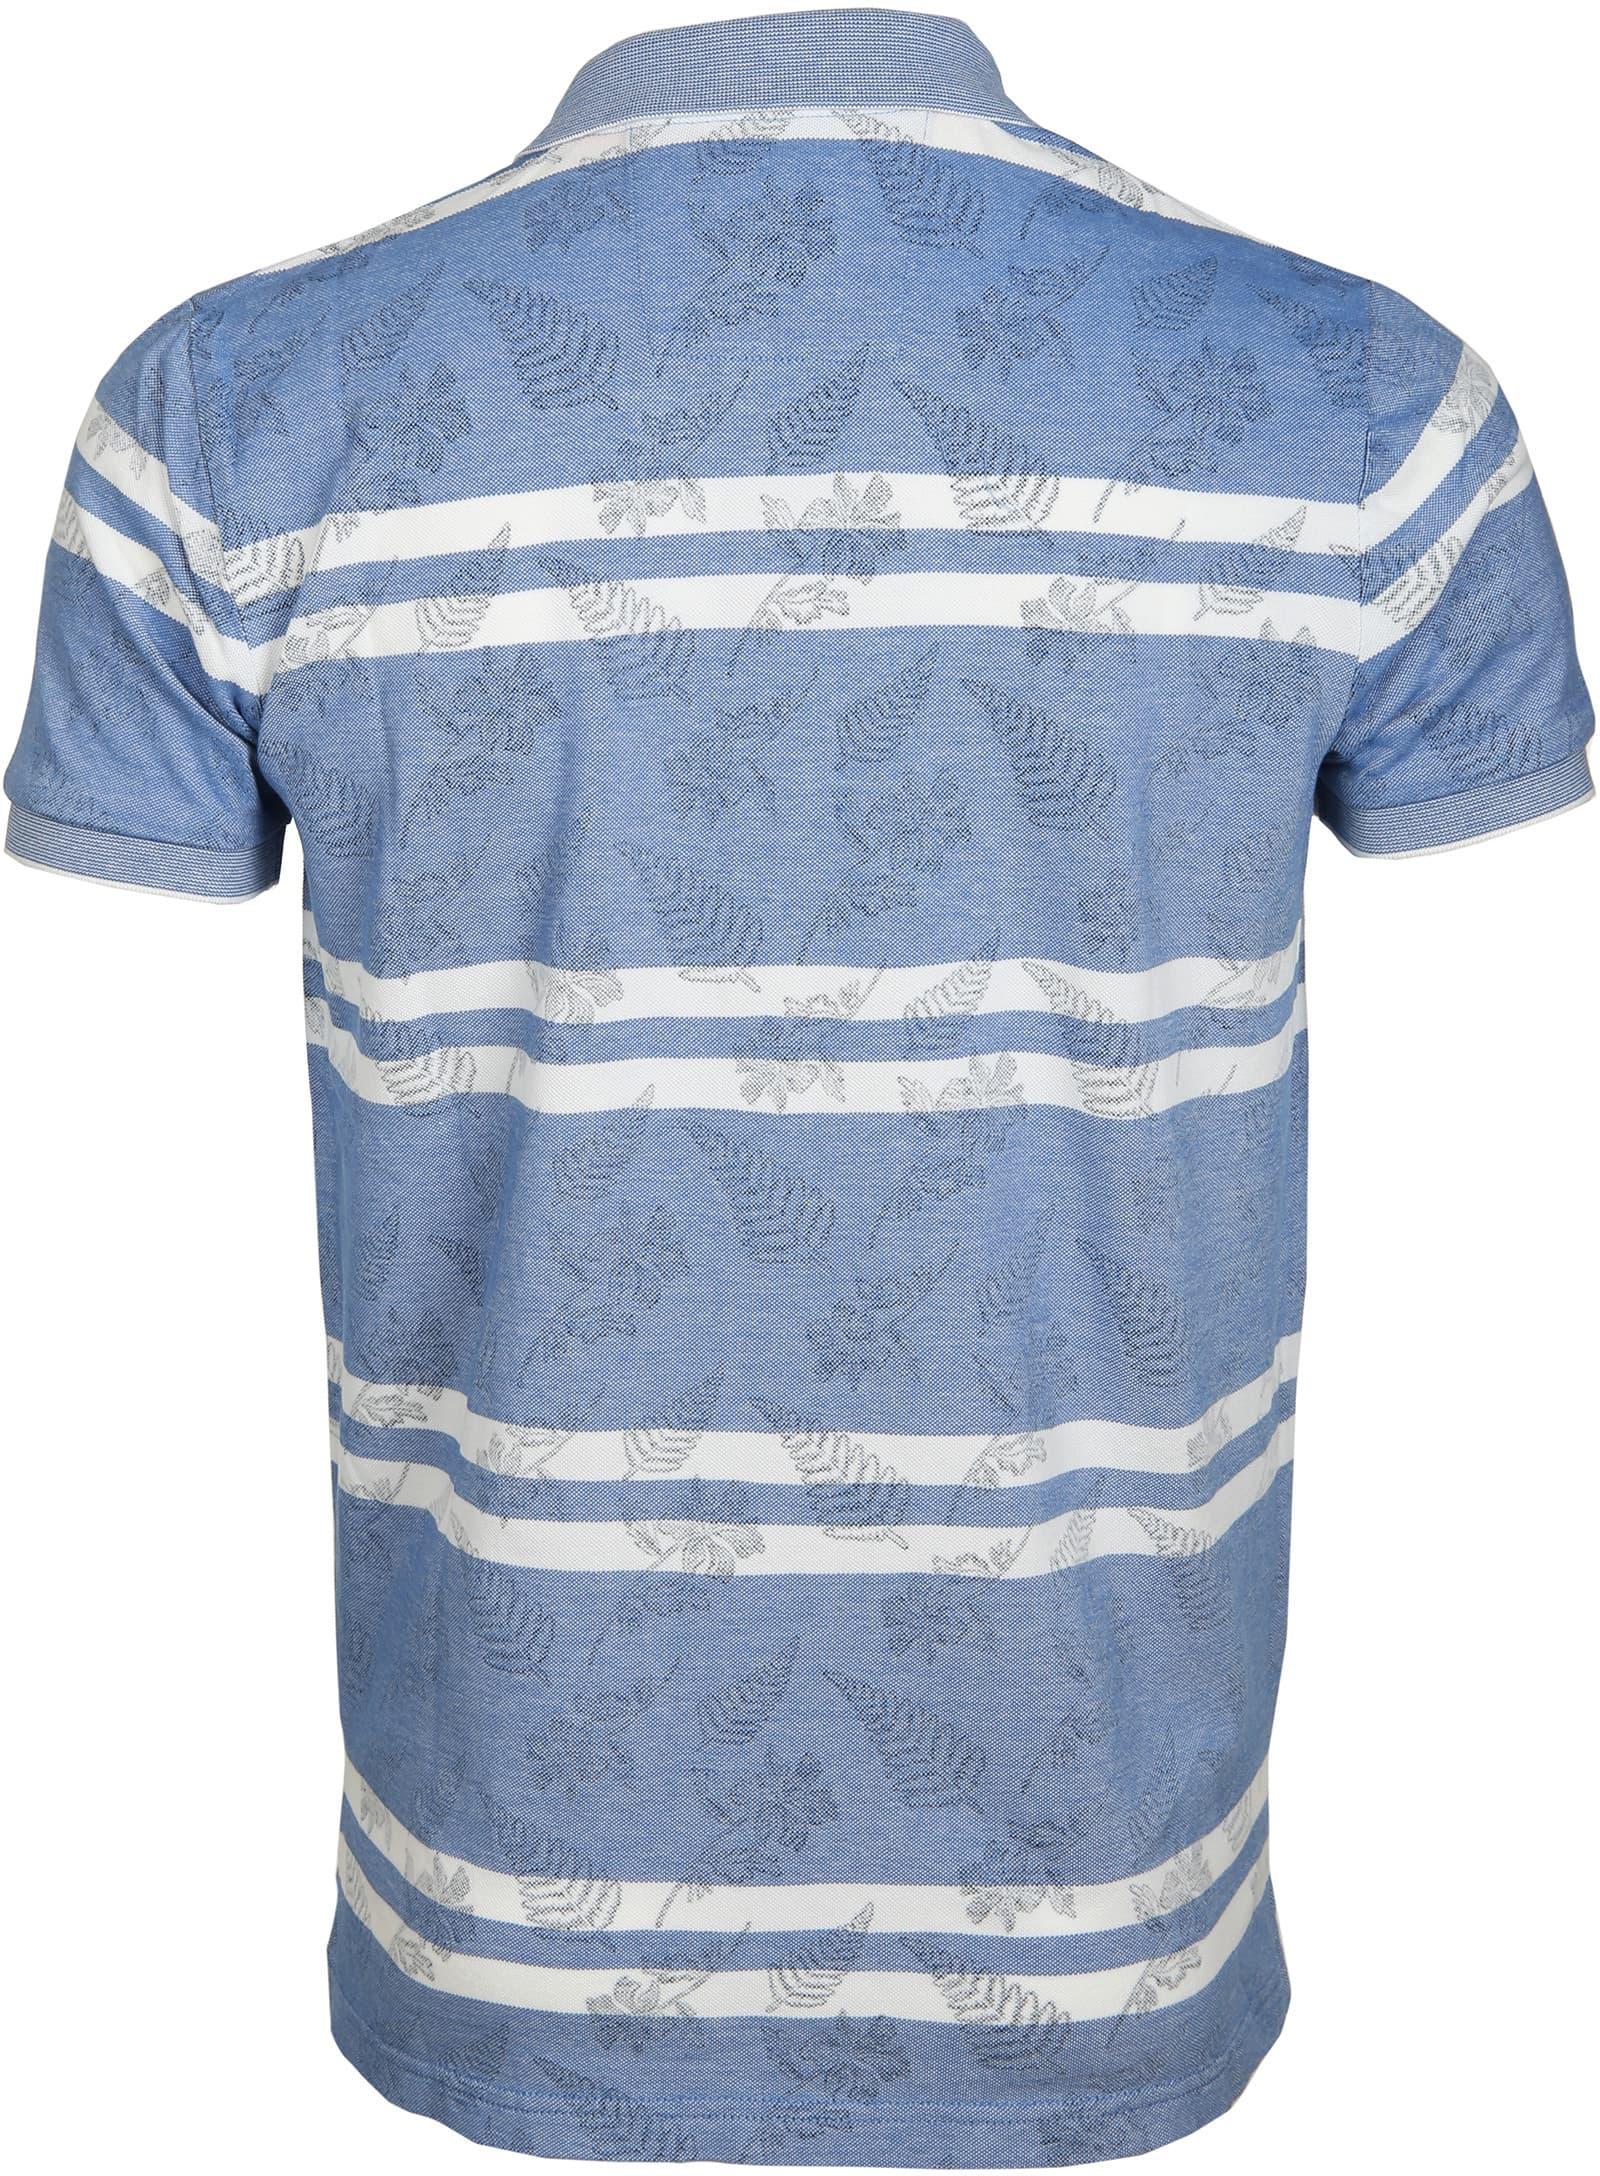 NZA Poloshirt Karamea Blau foto 2